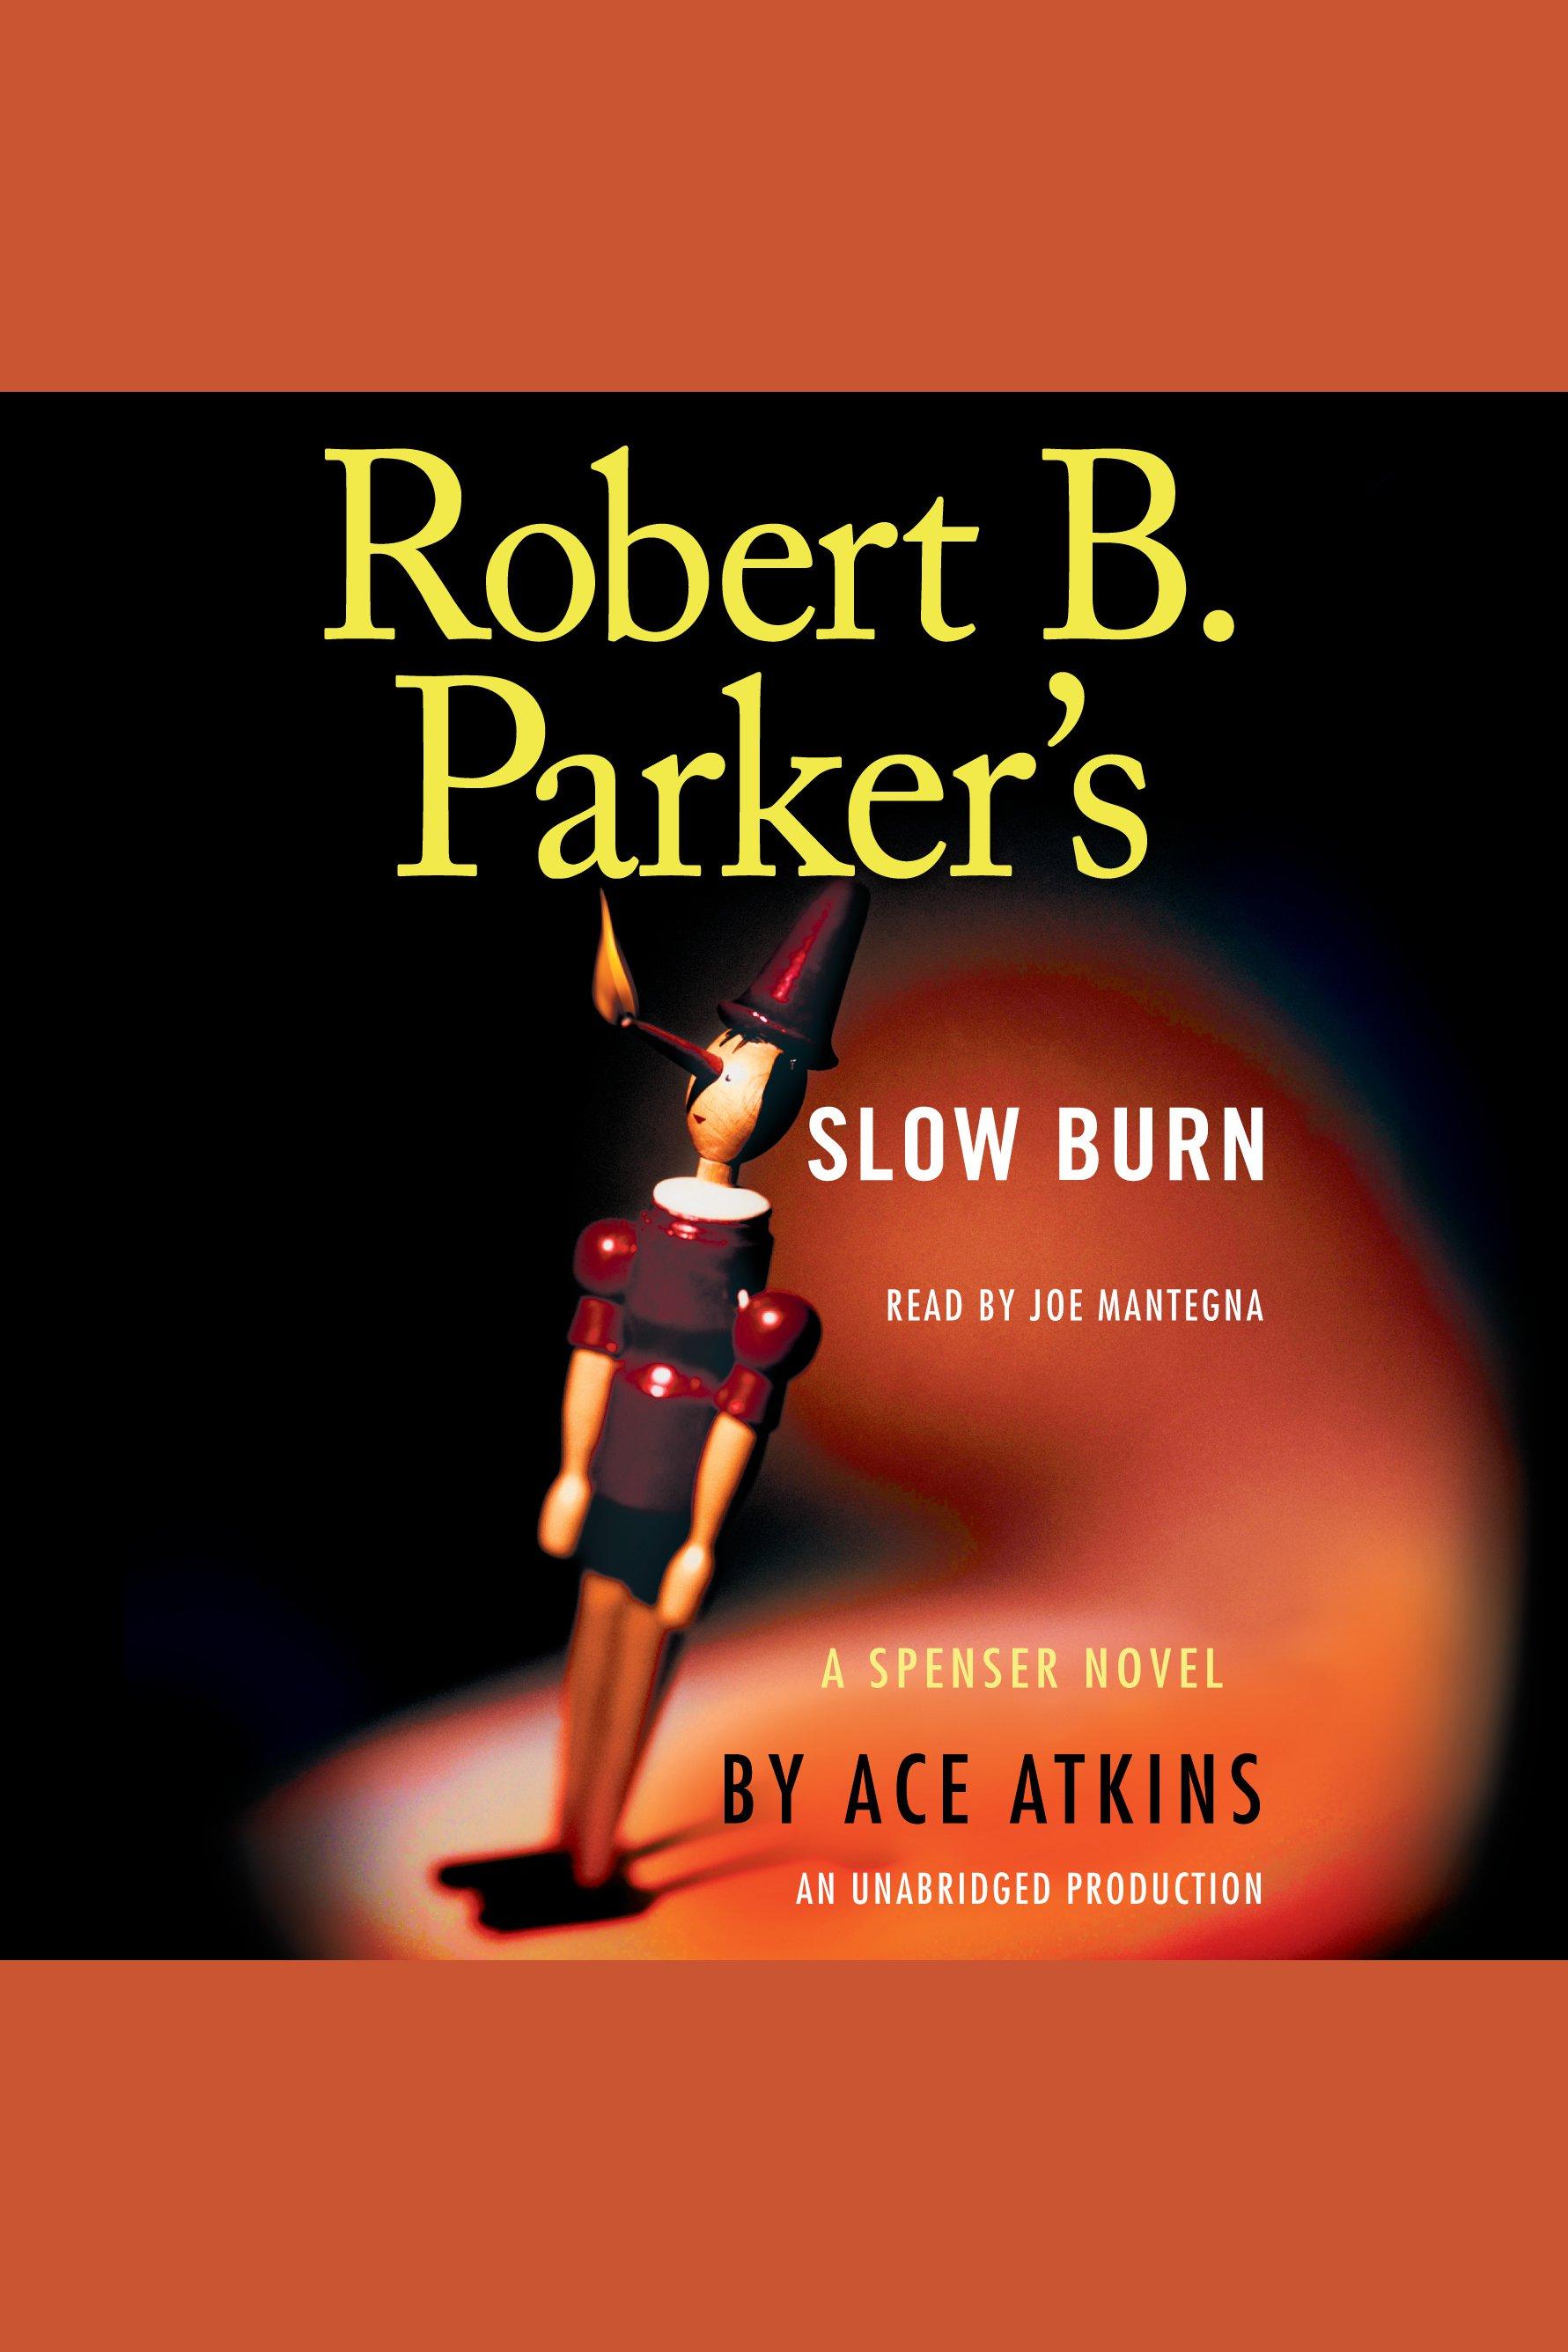 Robert B. Parker's slow burn cover image